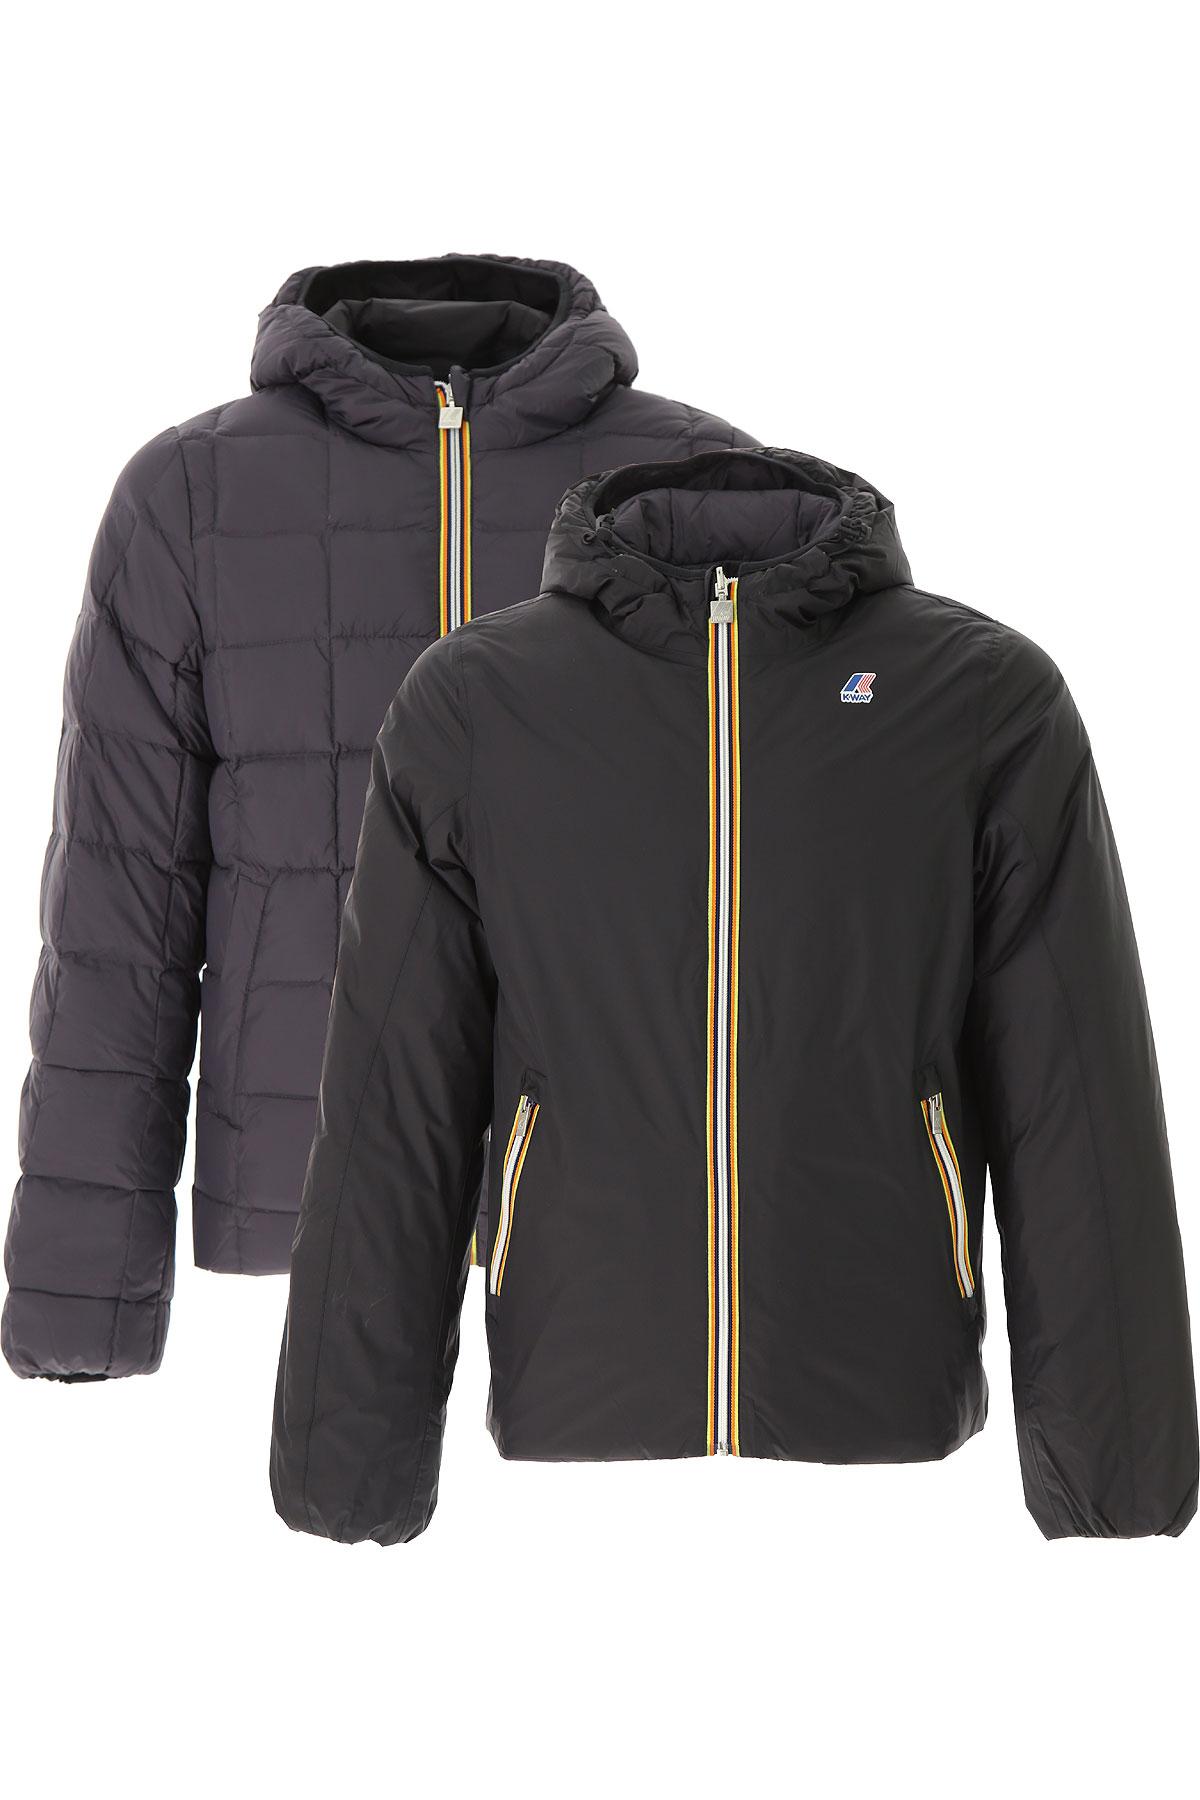 Image of K-Way Down Jacket for Men, Puffer Ski Jacket, Reversible, Black, Down, 2017, L M XL